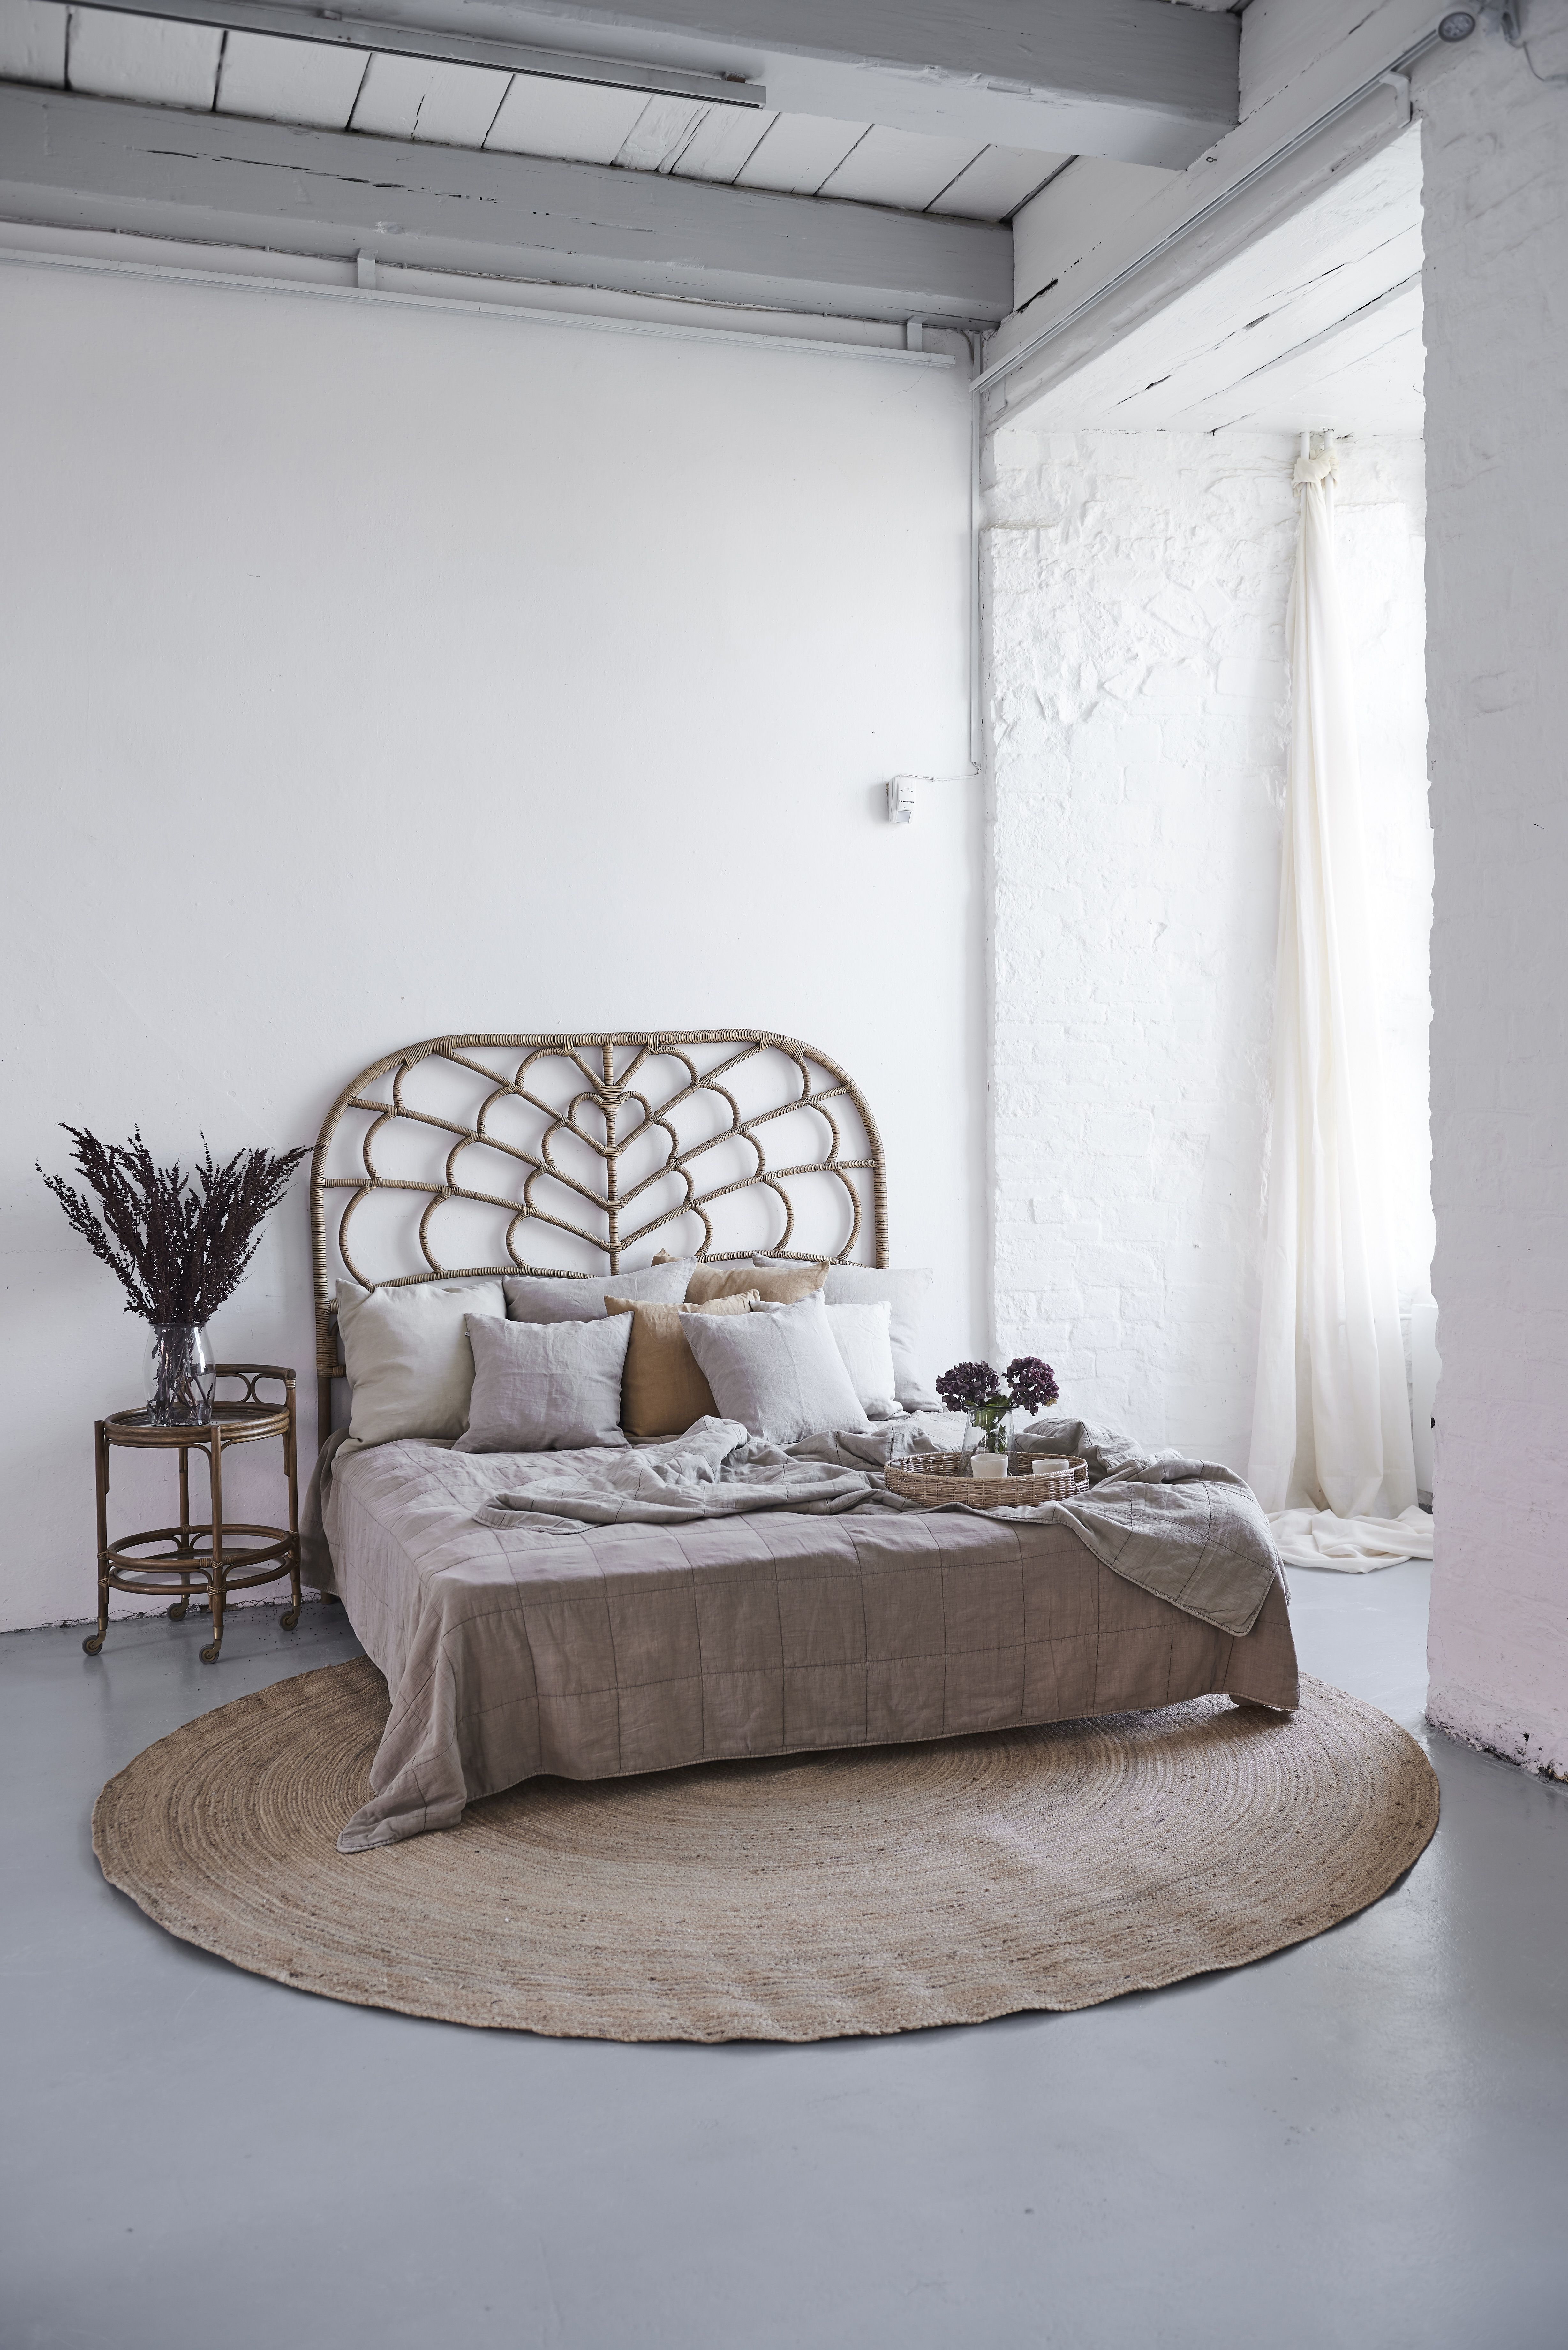 Urban Industrial Decor Tips In 2020 Schlafzimmermobel Rustikale